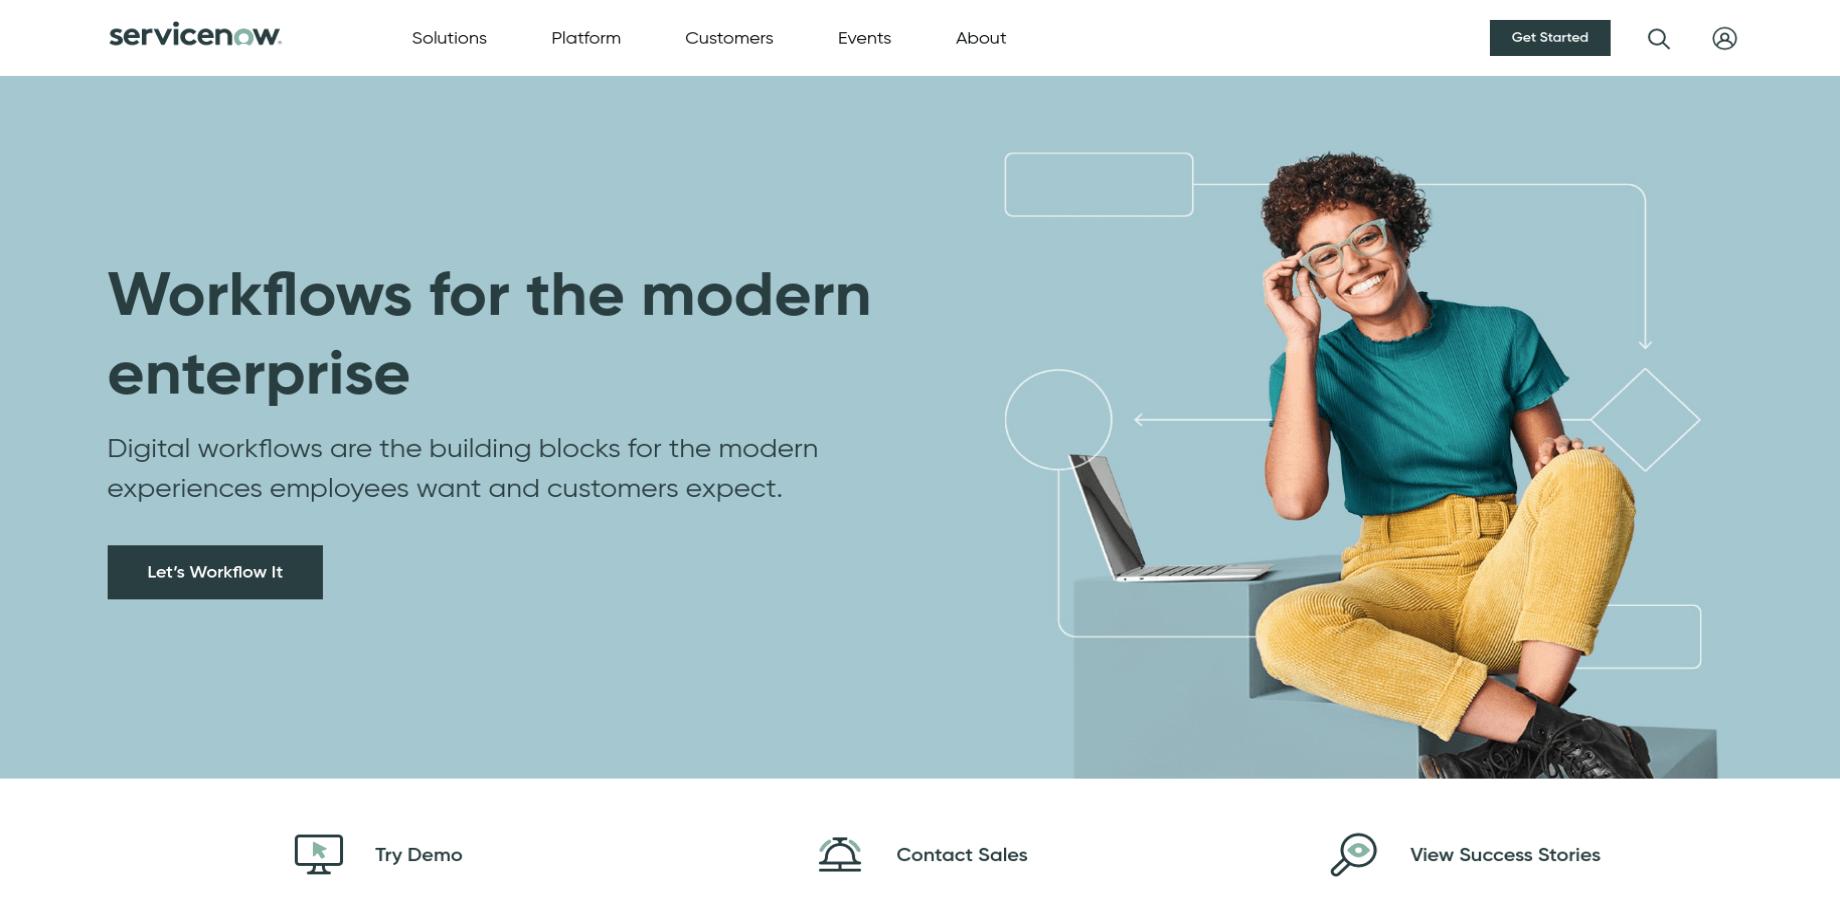 ServiceNow Landing Page Screenshot